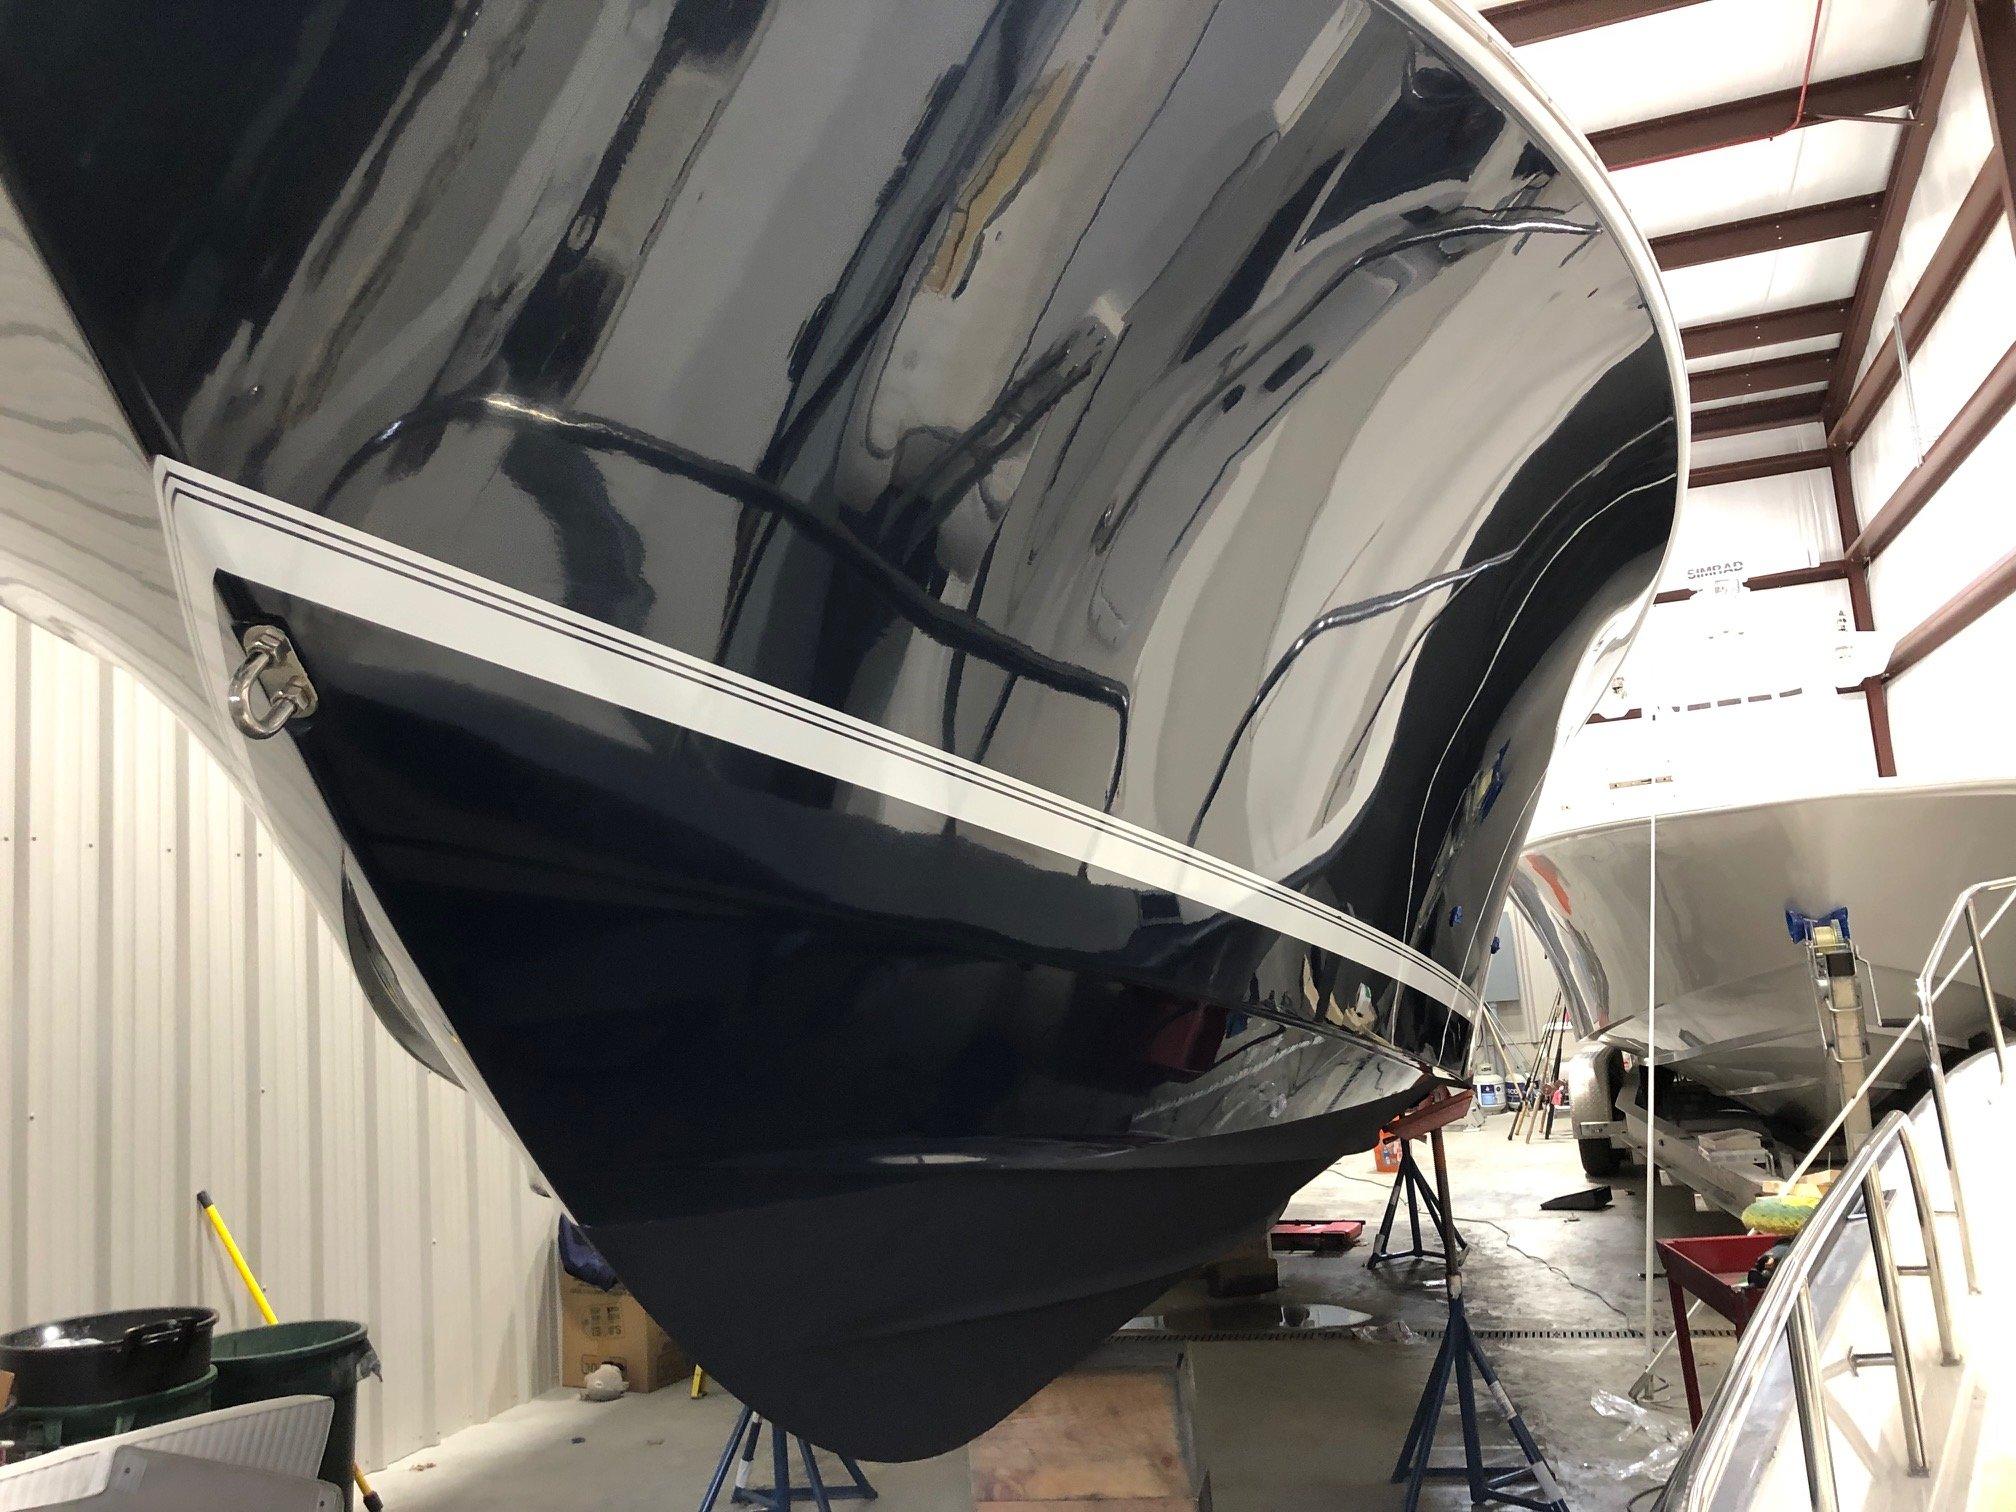 Should I bottom paint my boat?